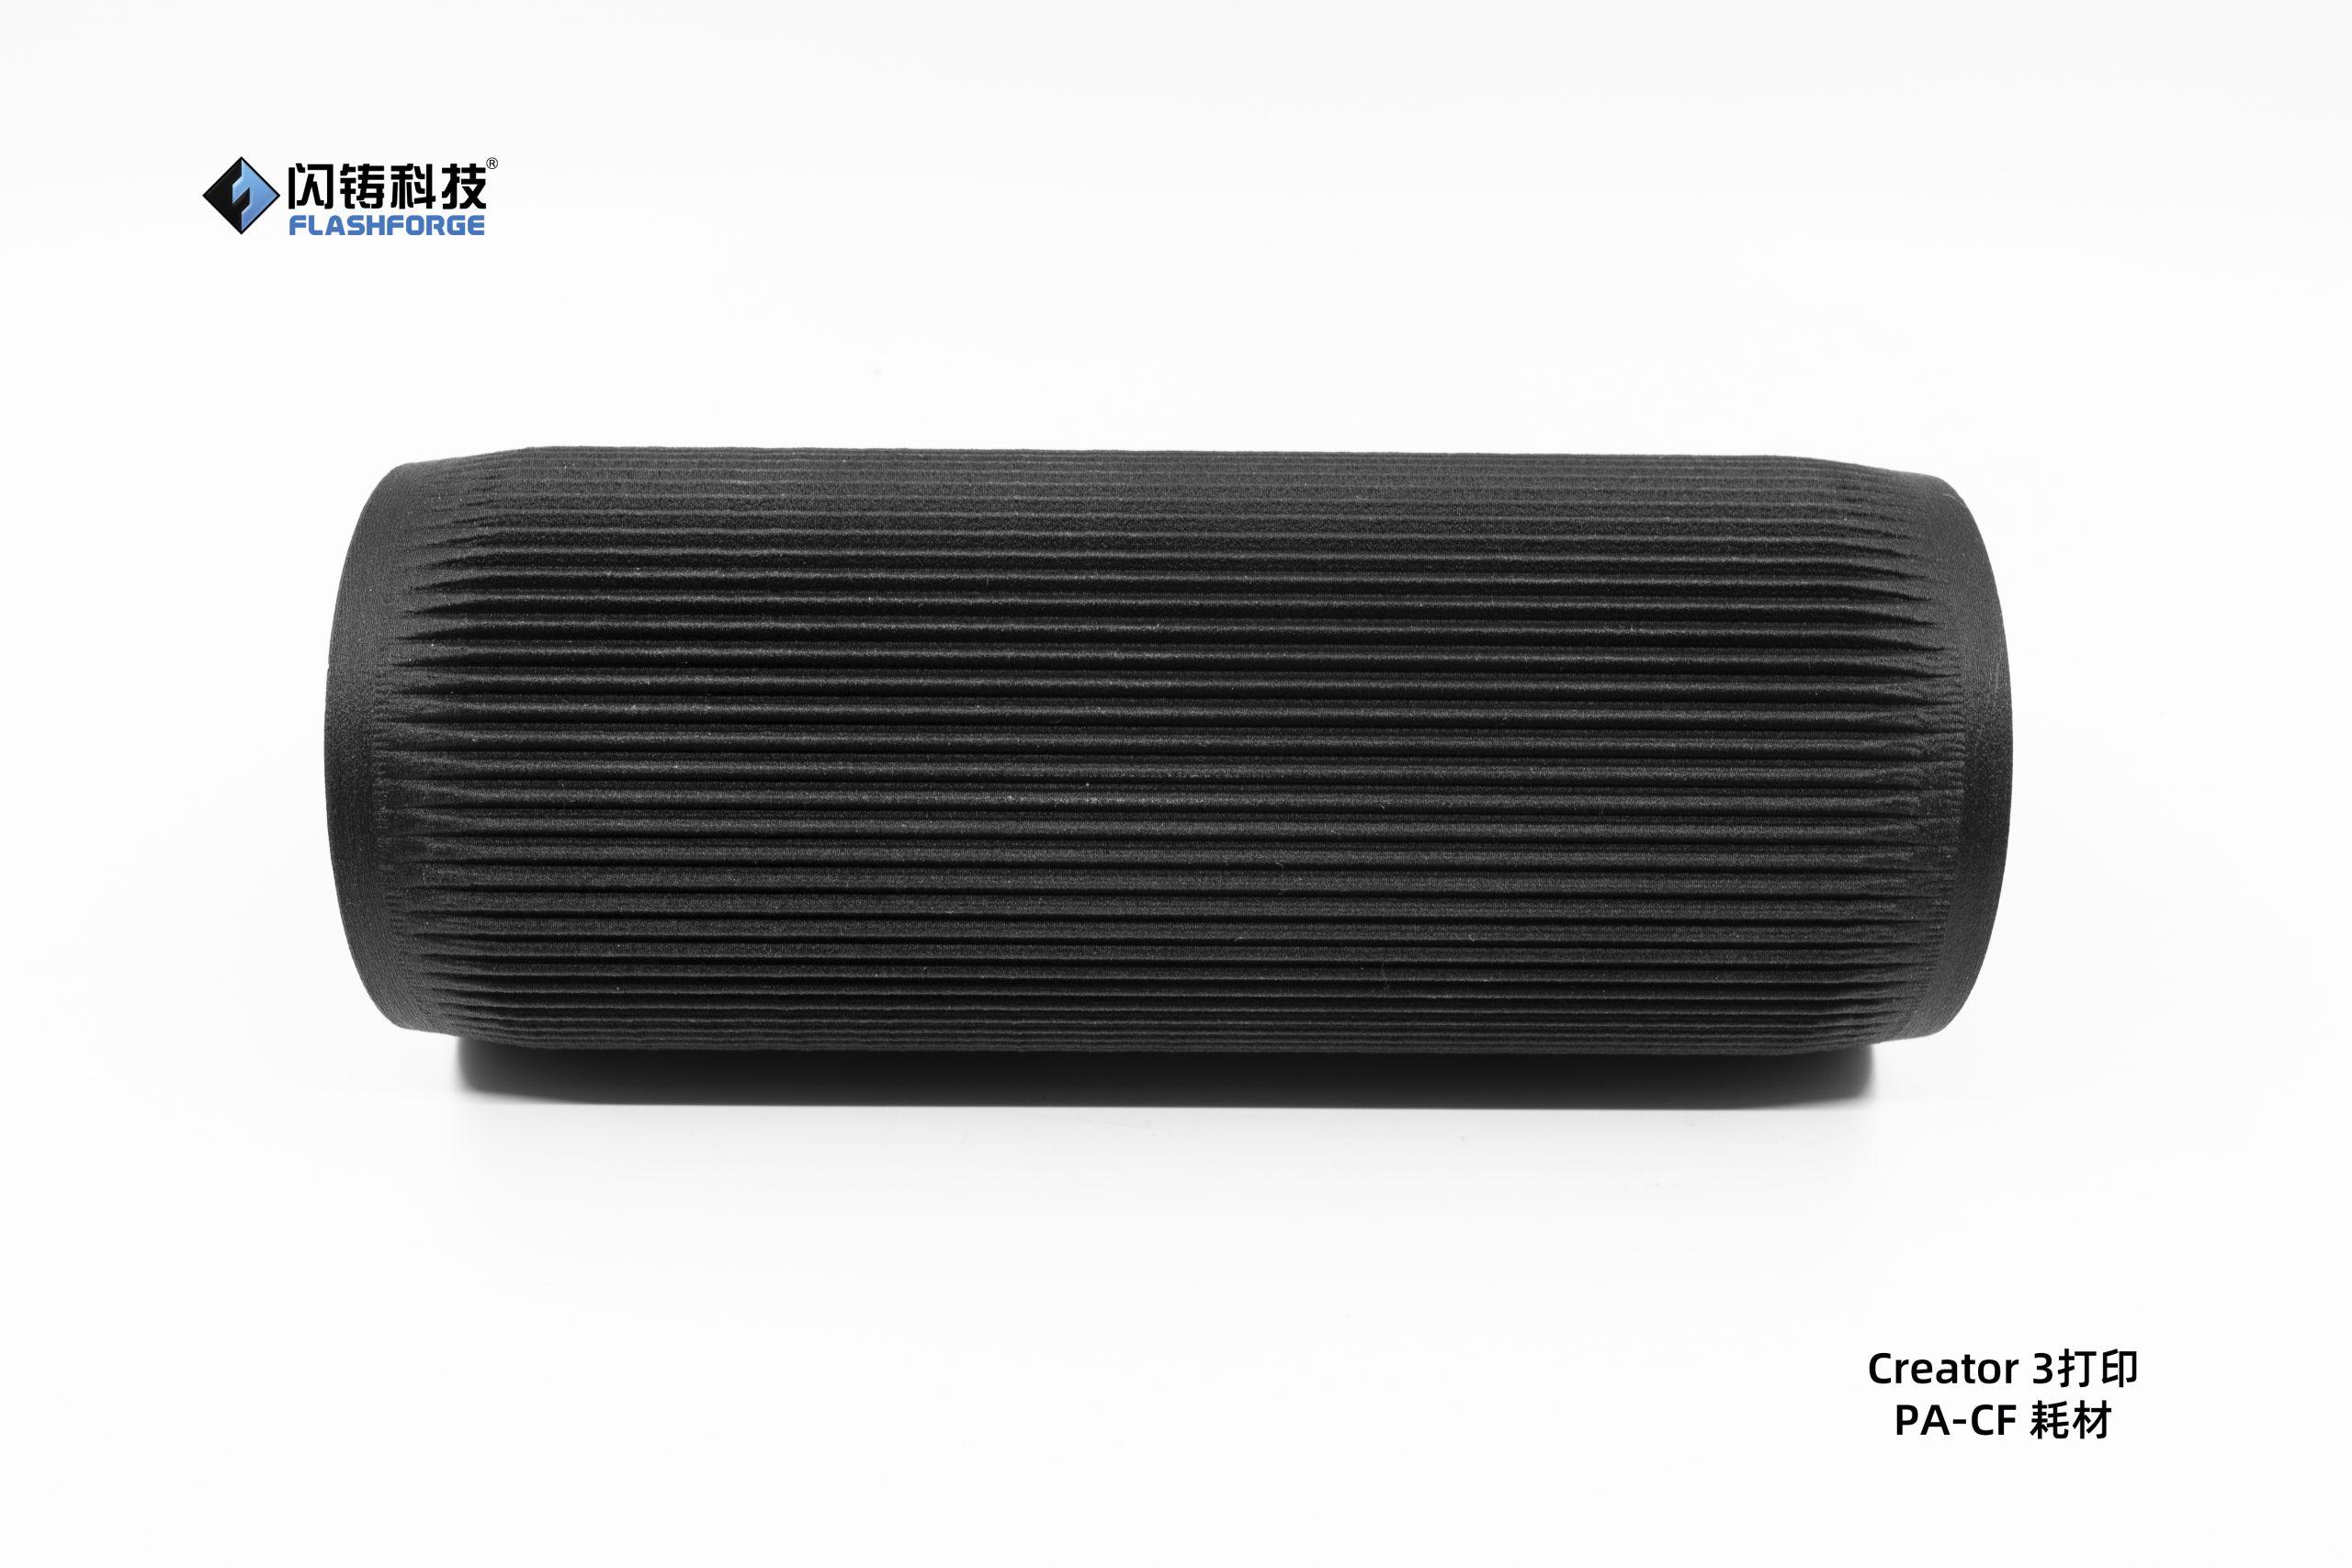 Carbon-fiber-filled Nylon part